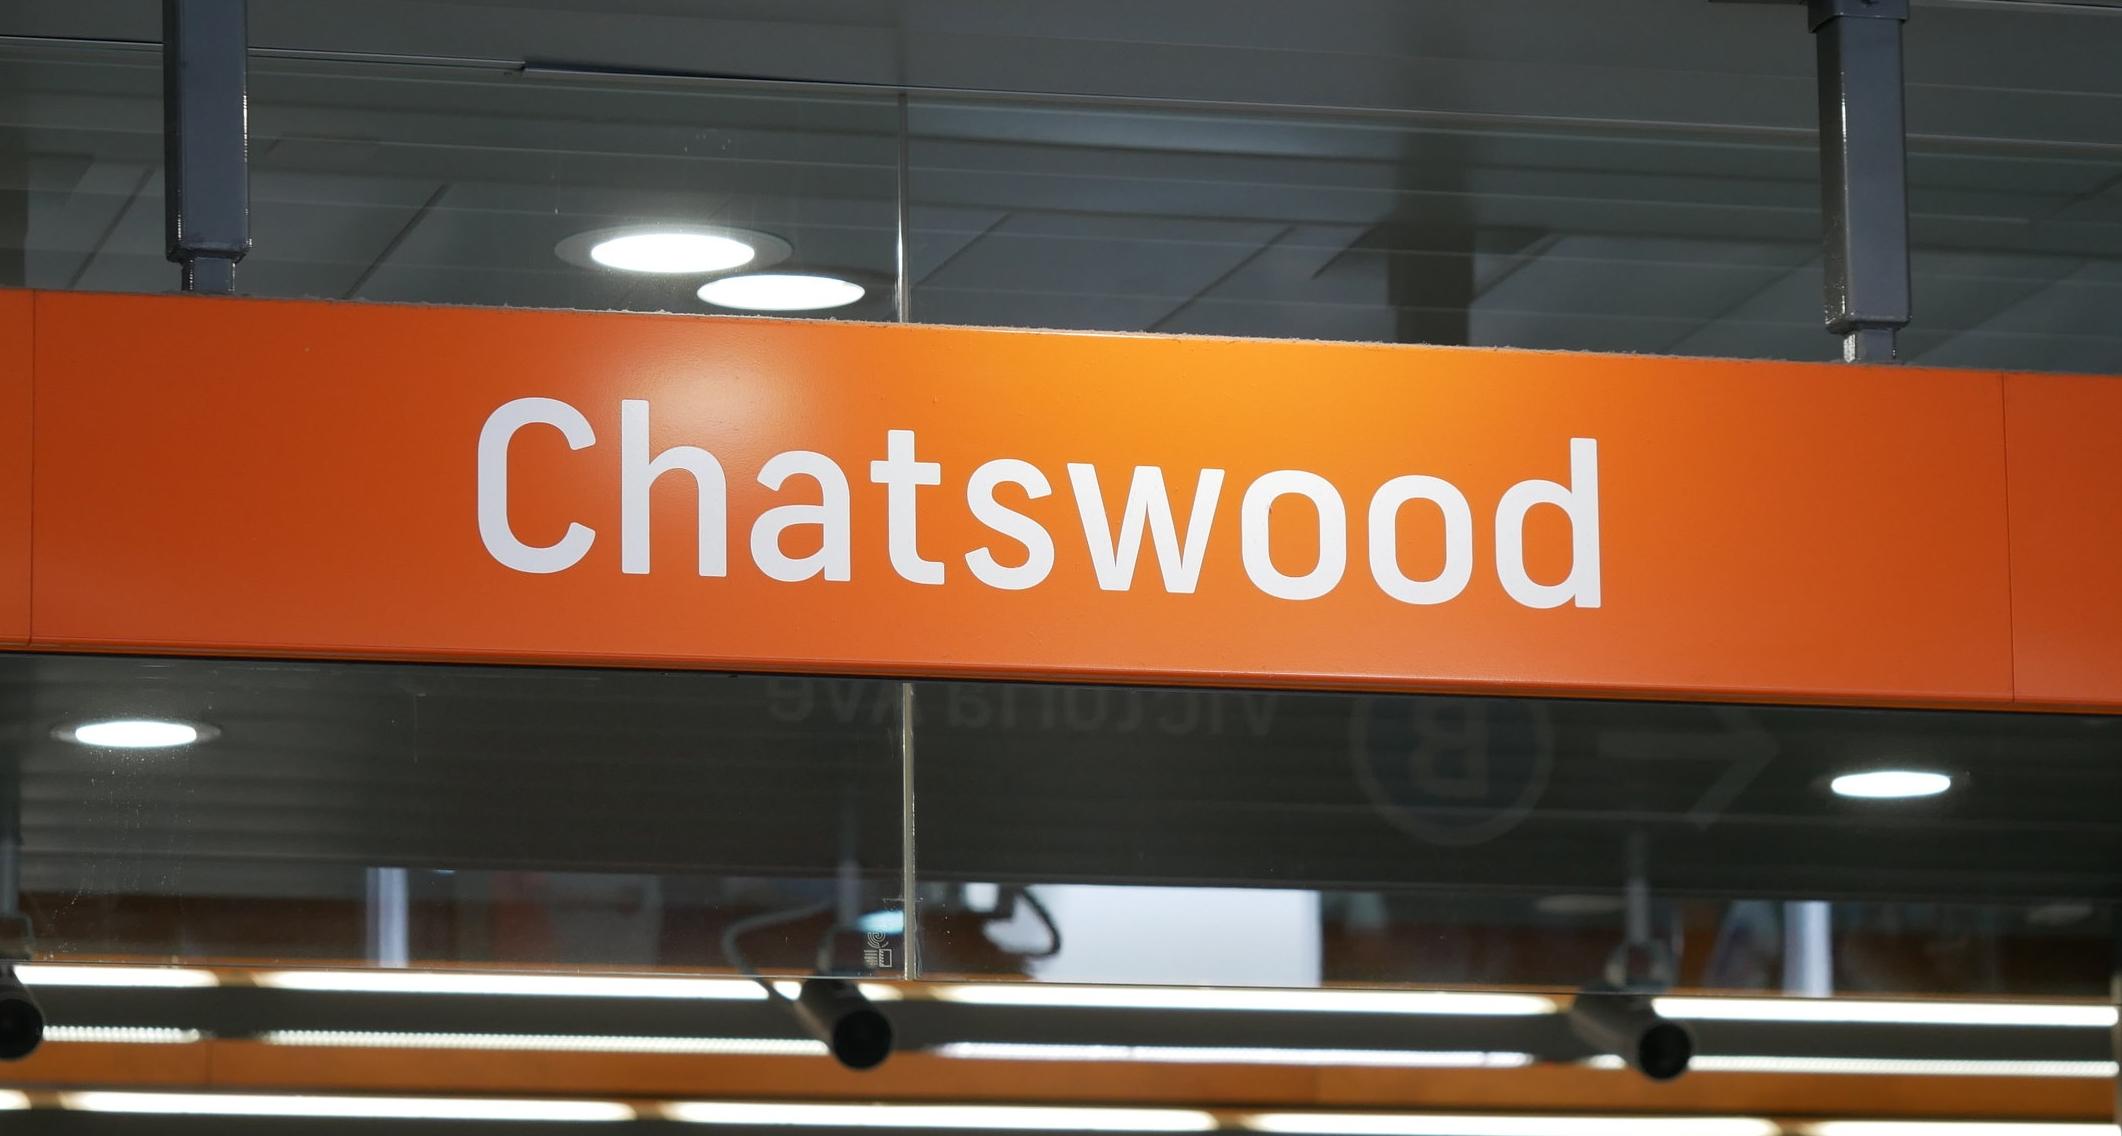 Chatswood sign